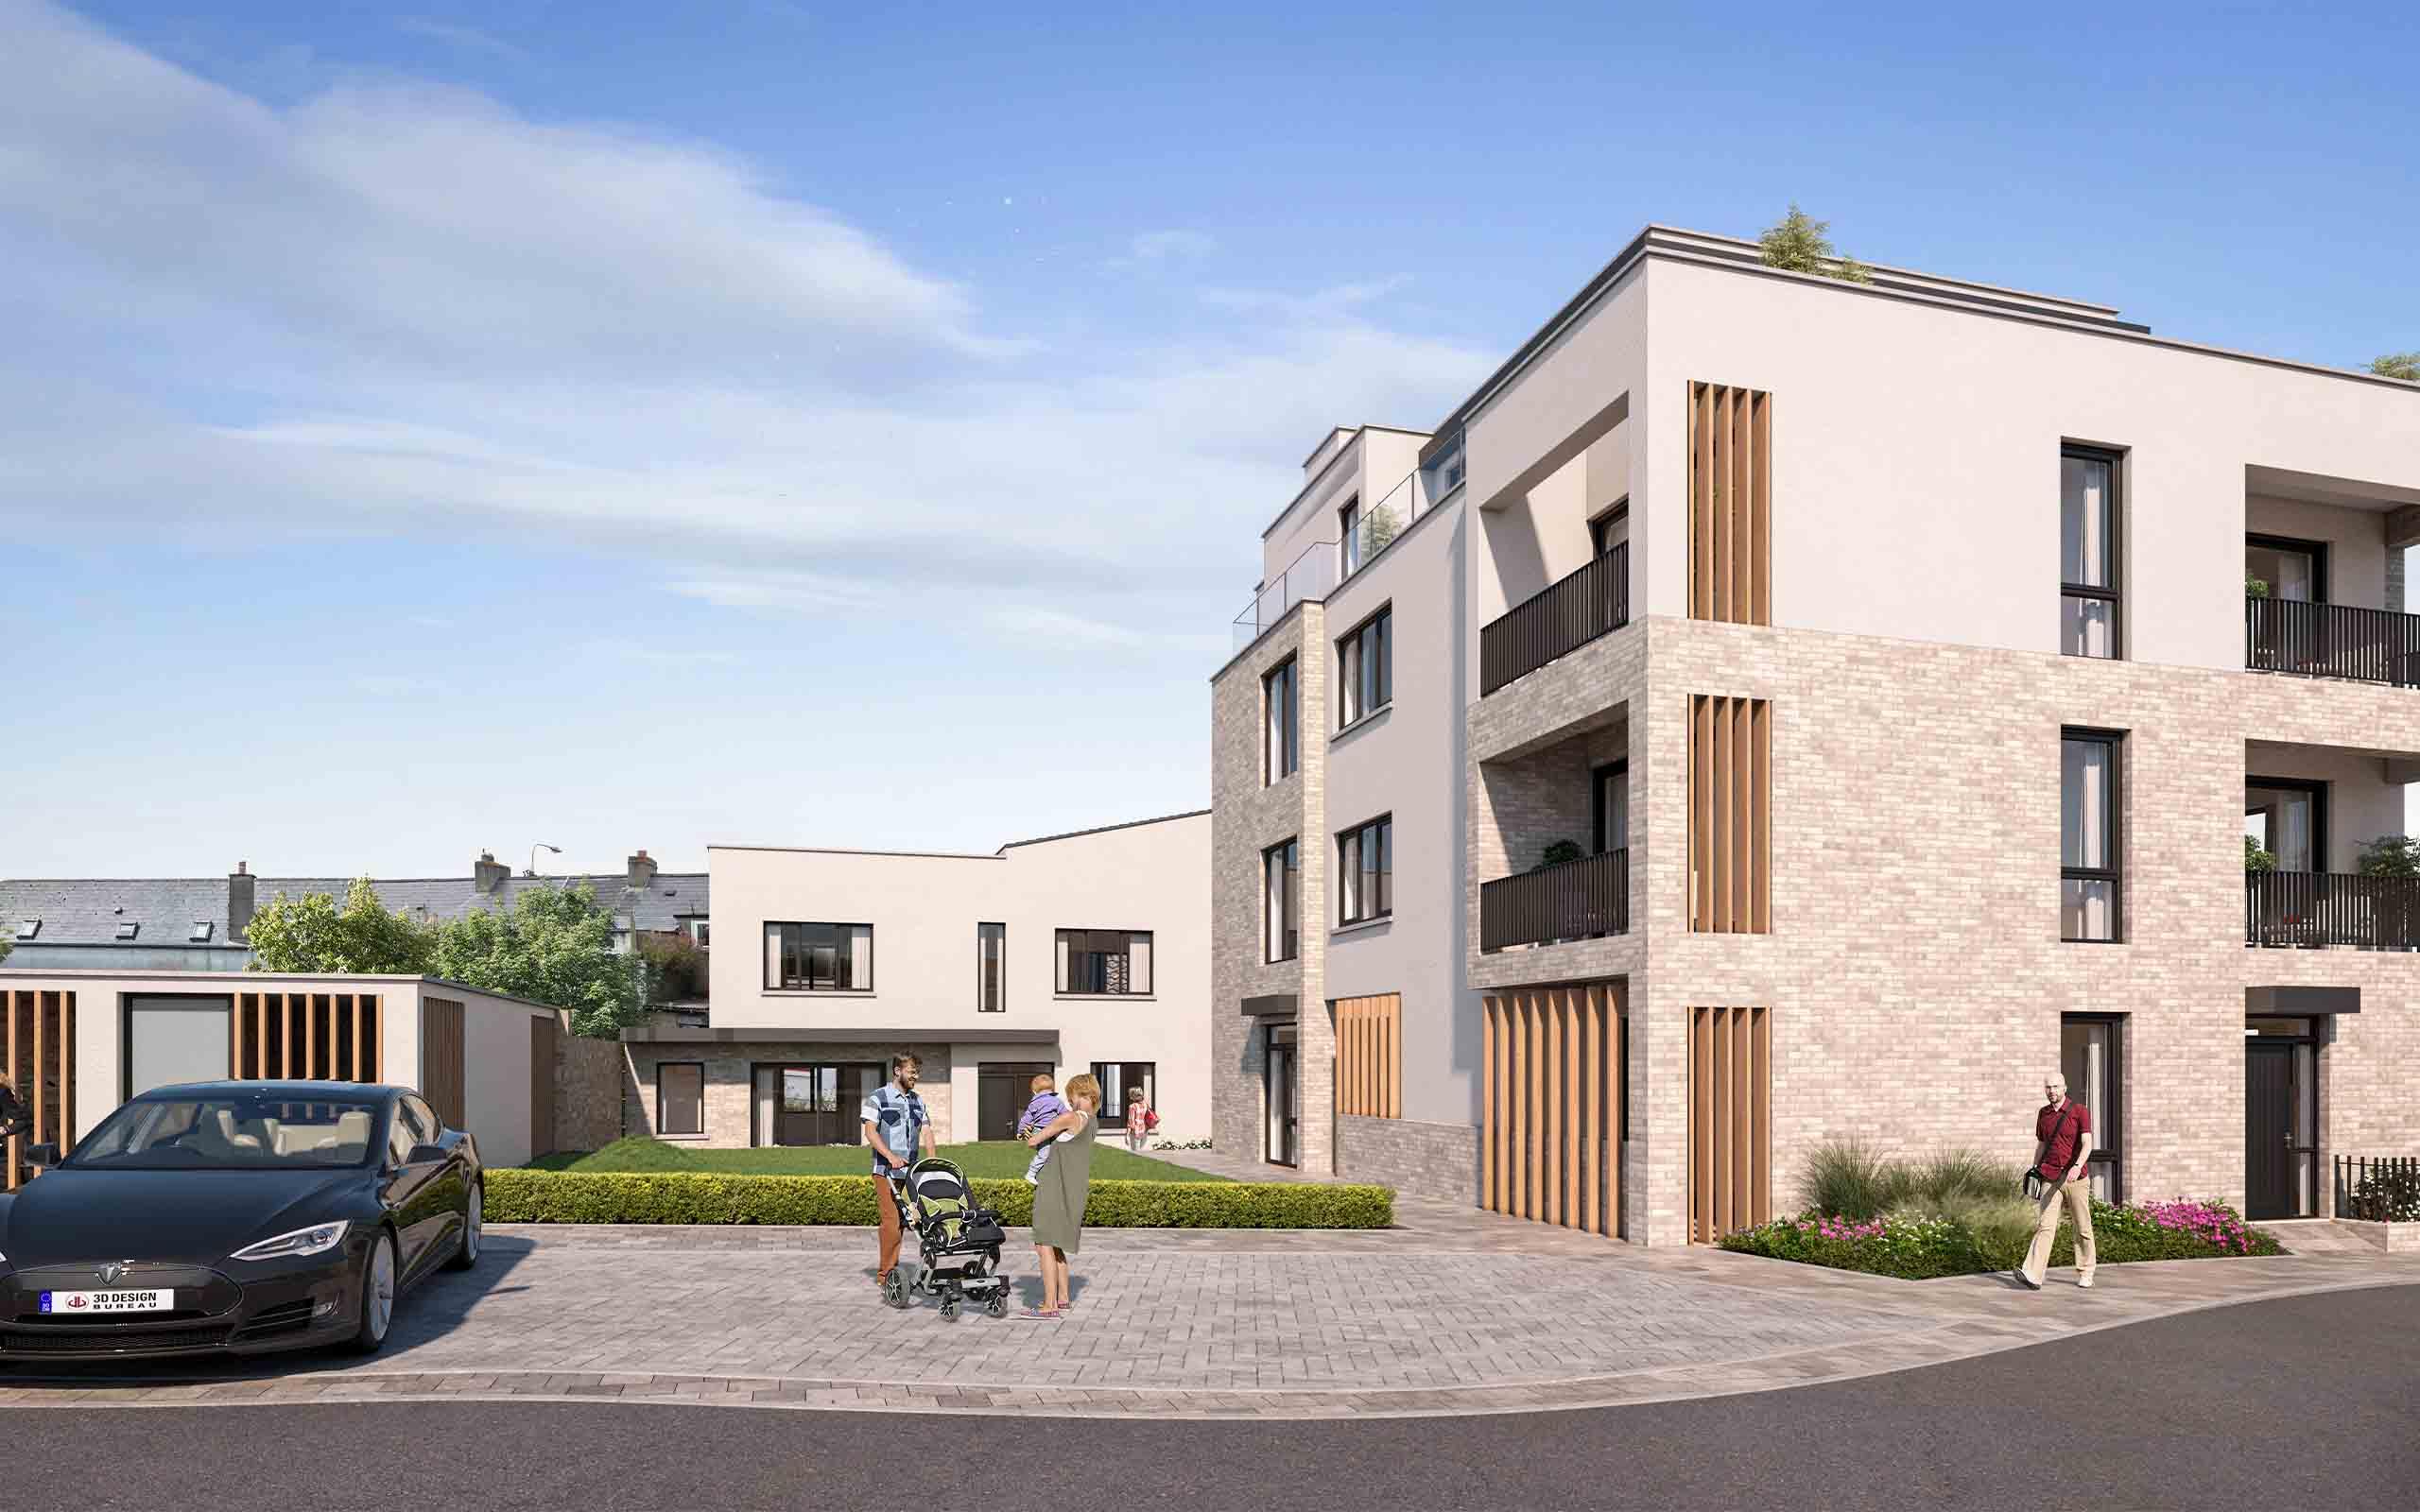 Architectural CGI of Residential Development in Kilkenny